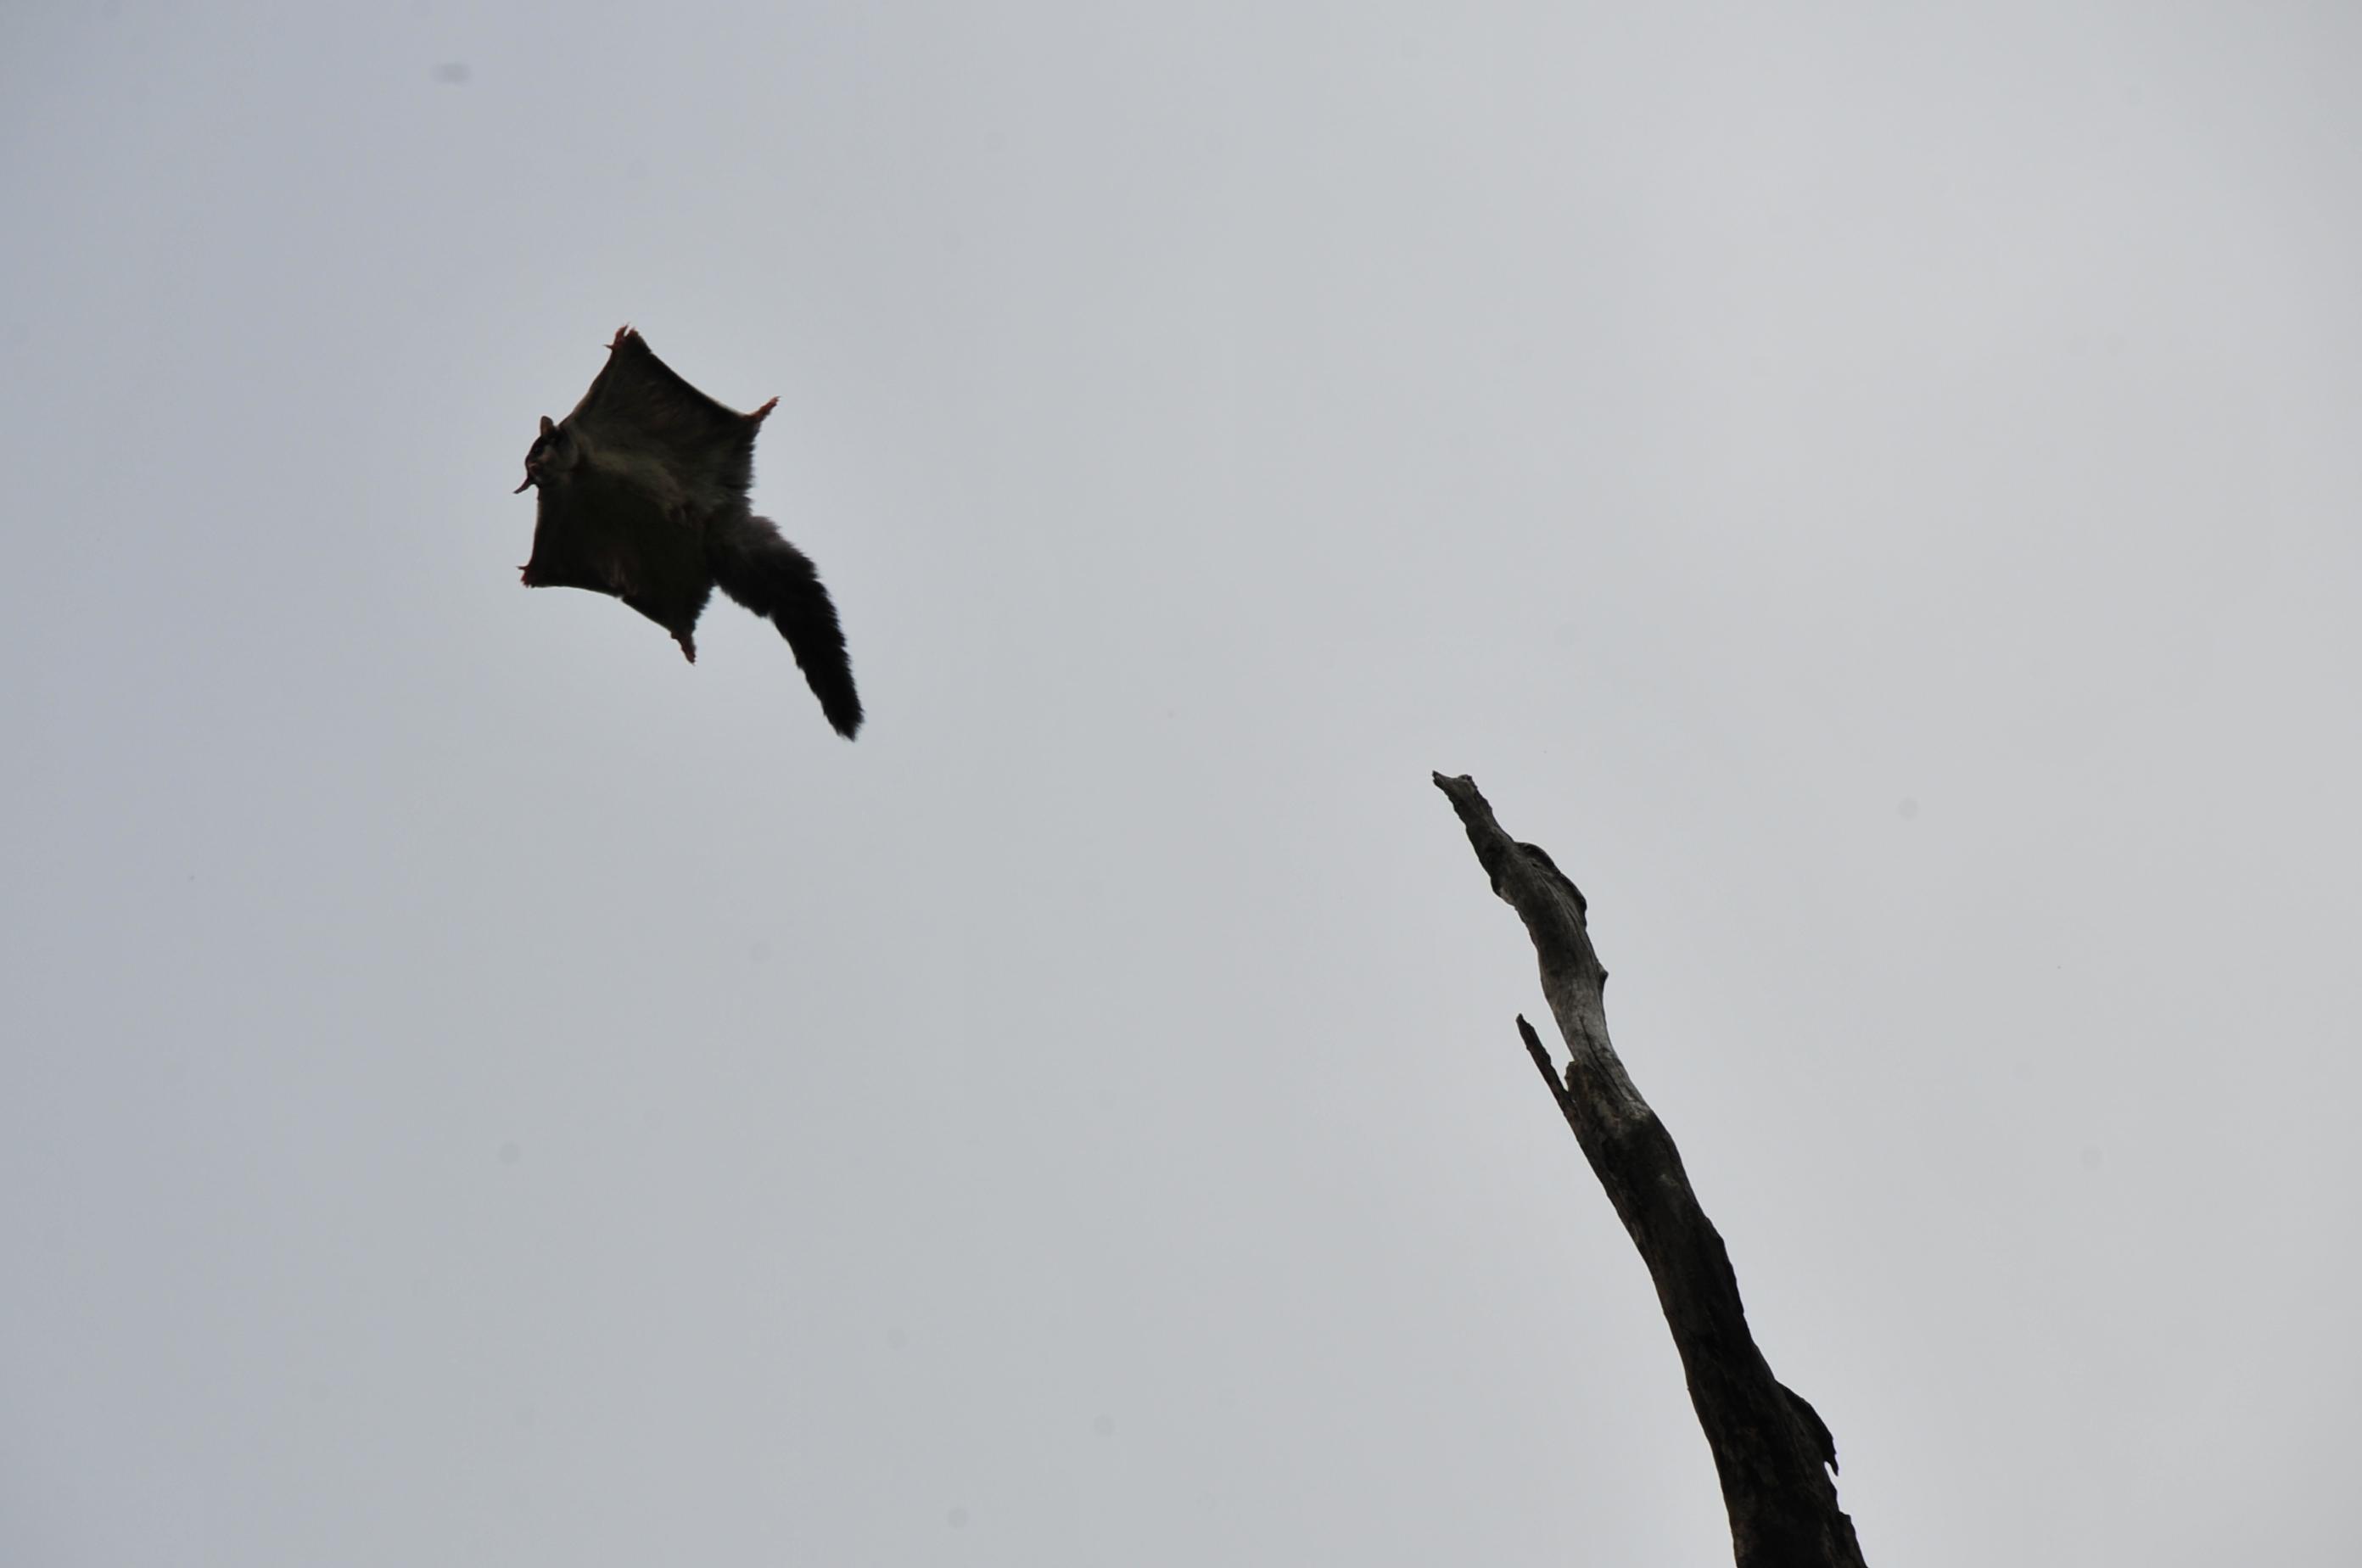 Squirrel Glider launching off a dead Eucalyptus tree (Alex Bonazzi, 2009)